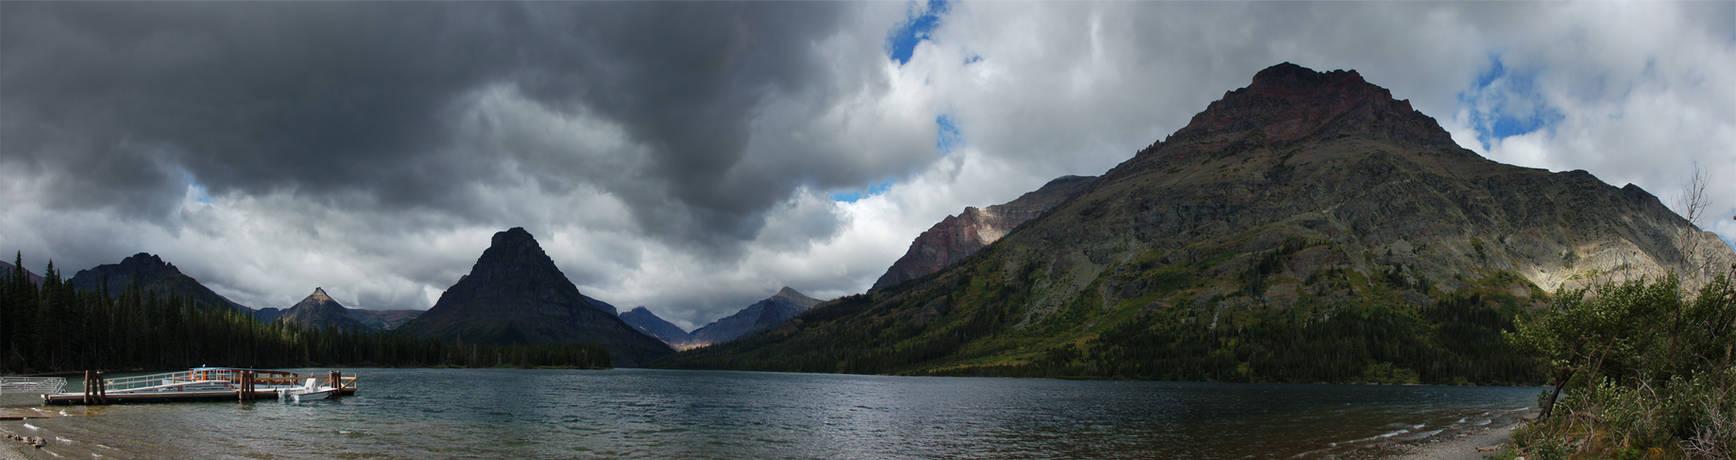 Two Medicine Lake 2007-08-21